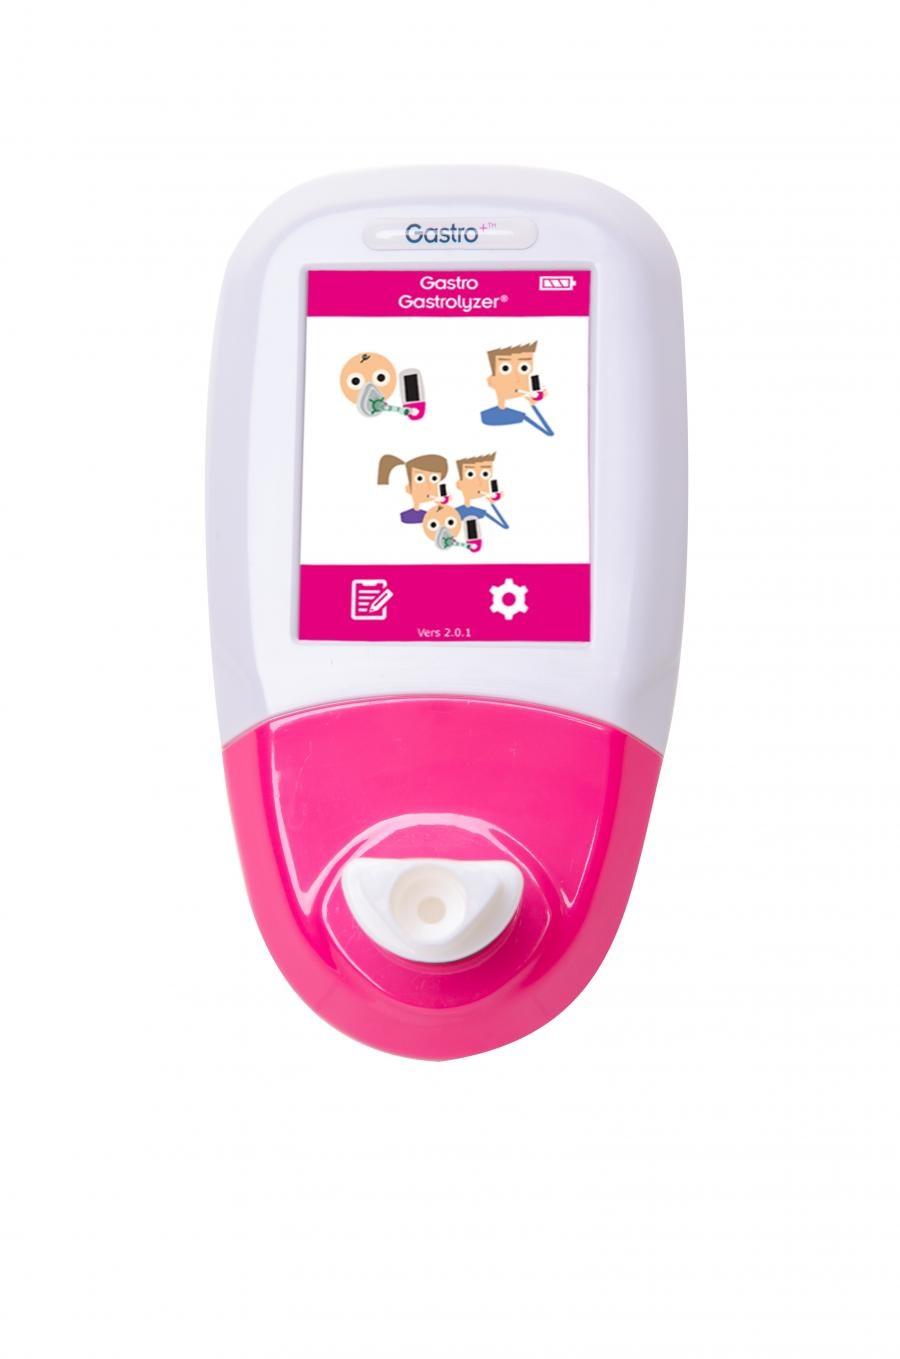 Gastro+ TM Gastrolyzer® Breath Monitor from Bedfont Scientific